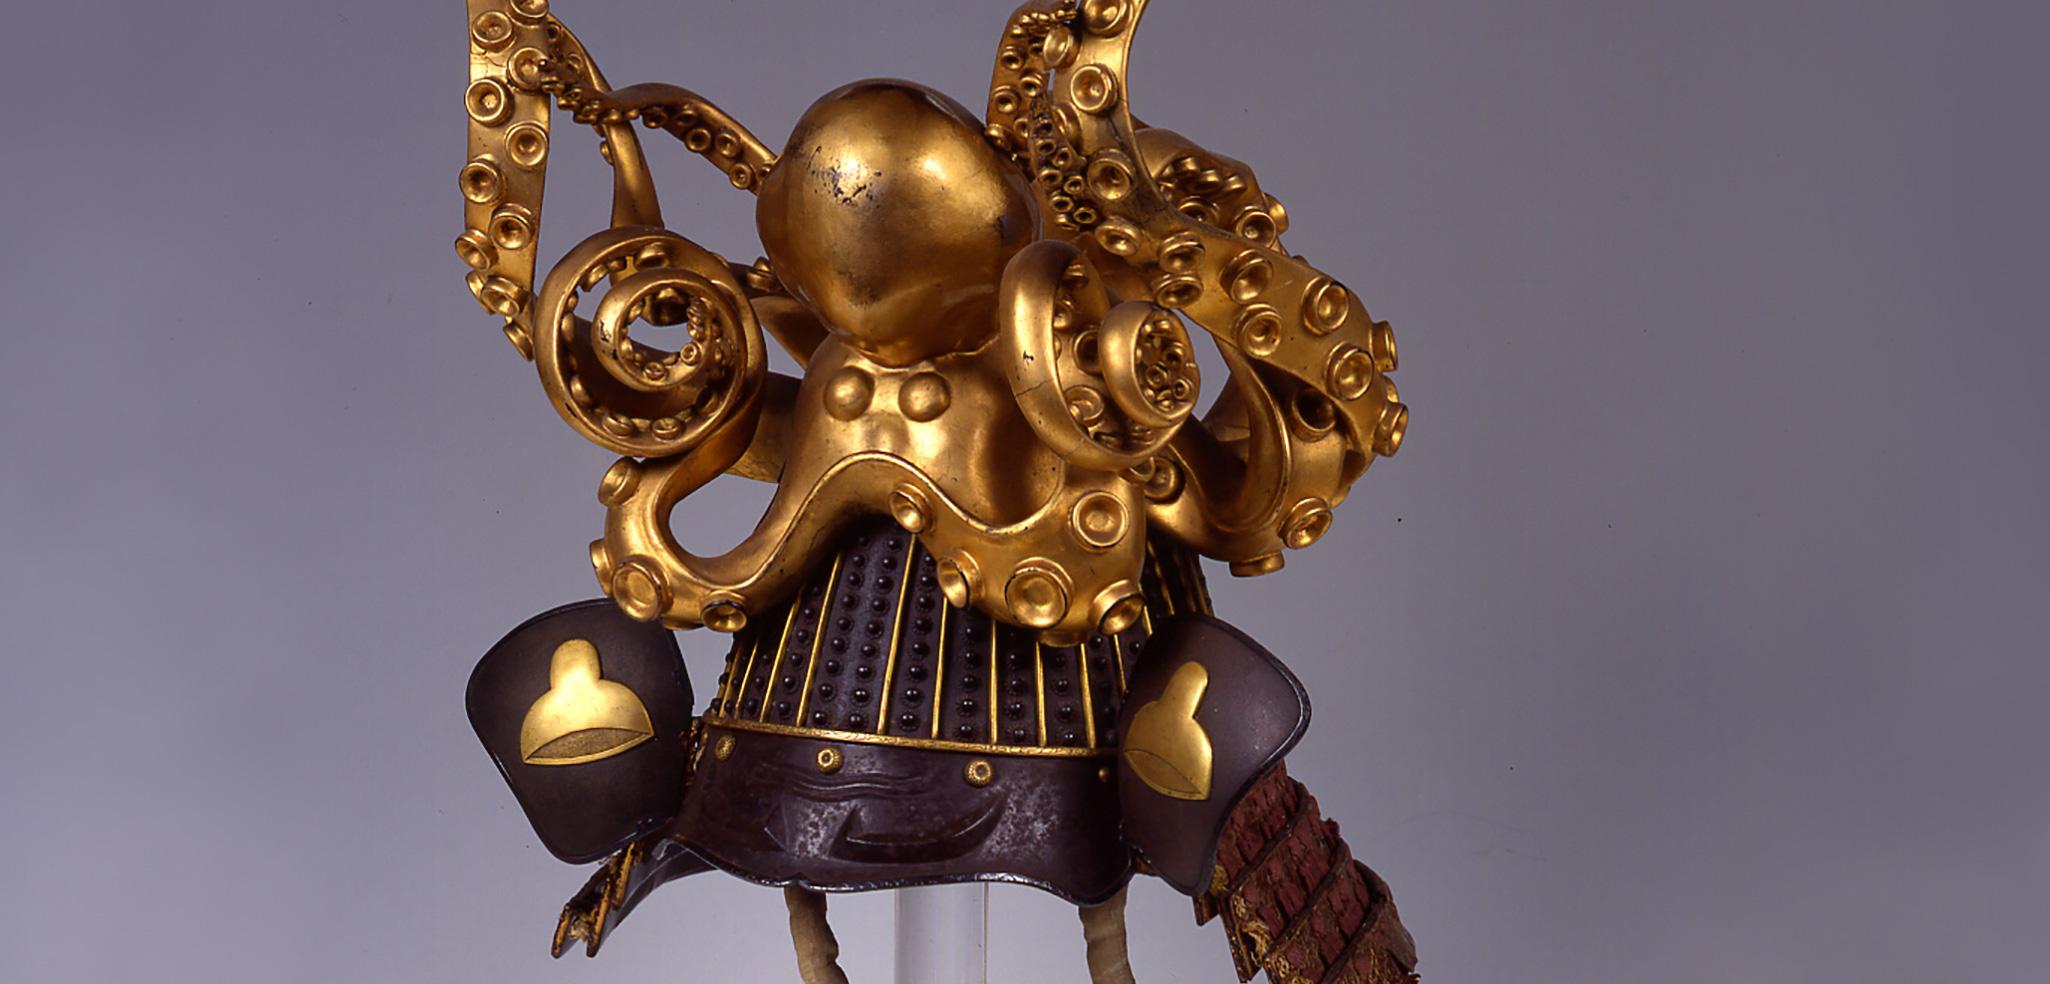 samurai helmet with octopus topper